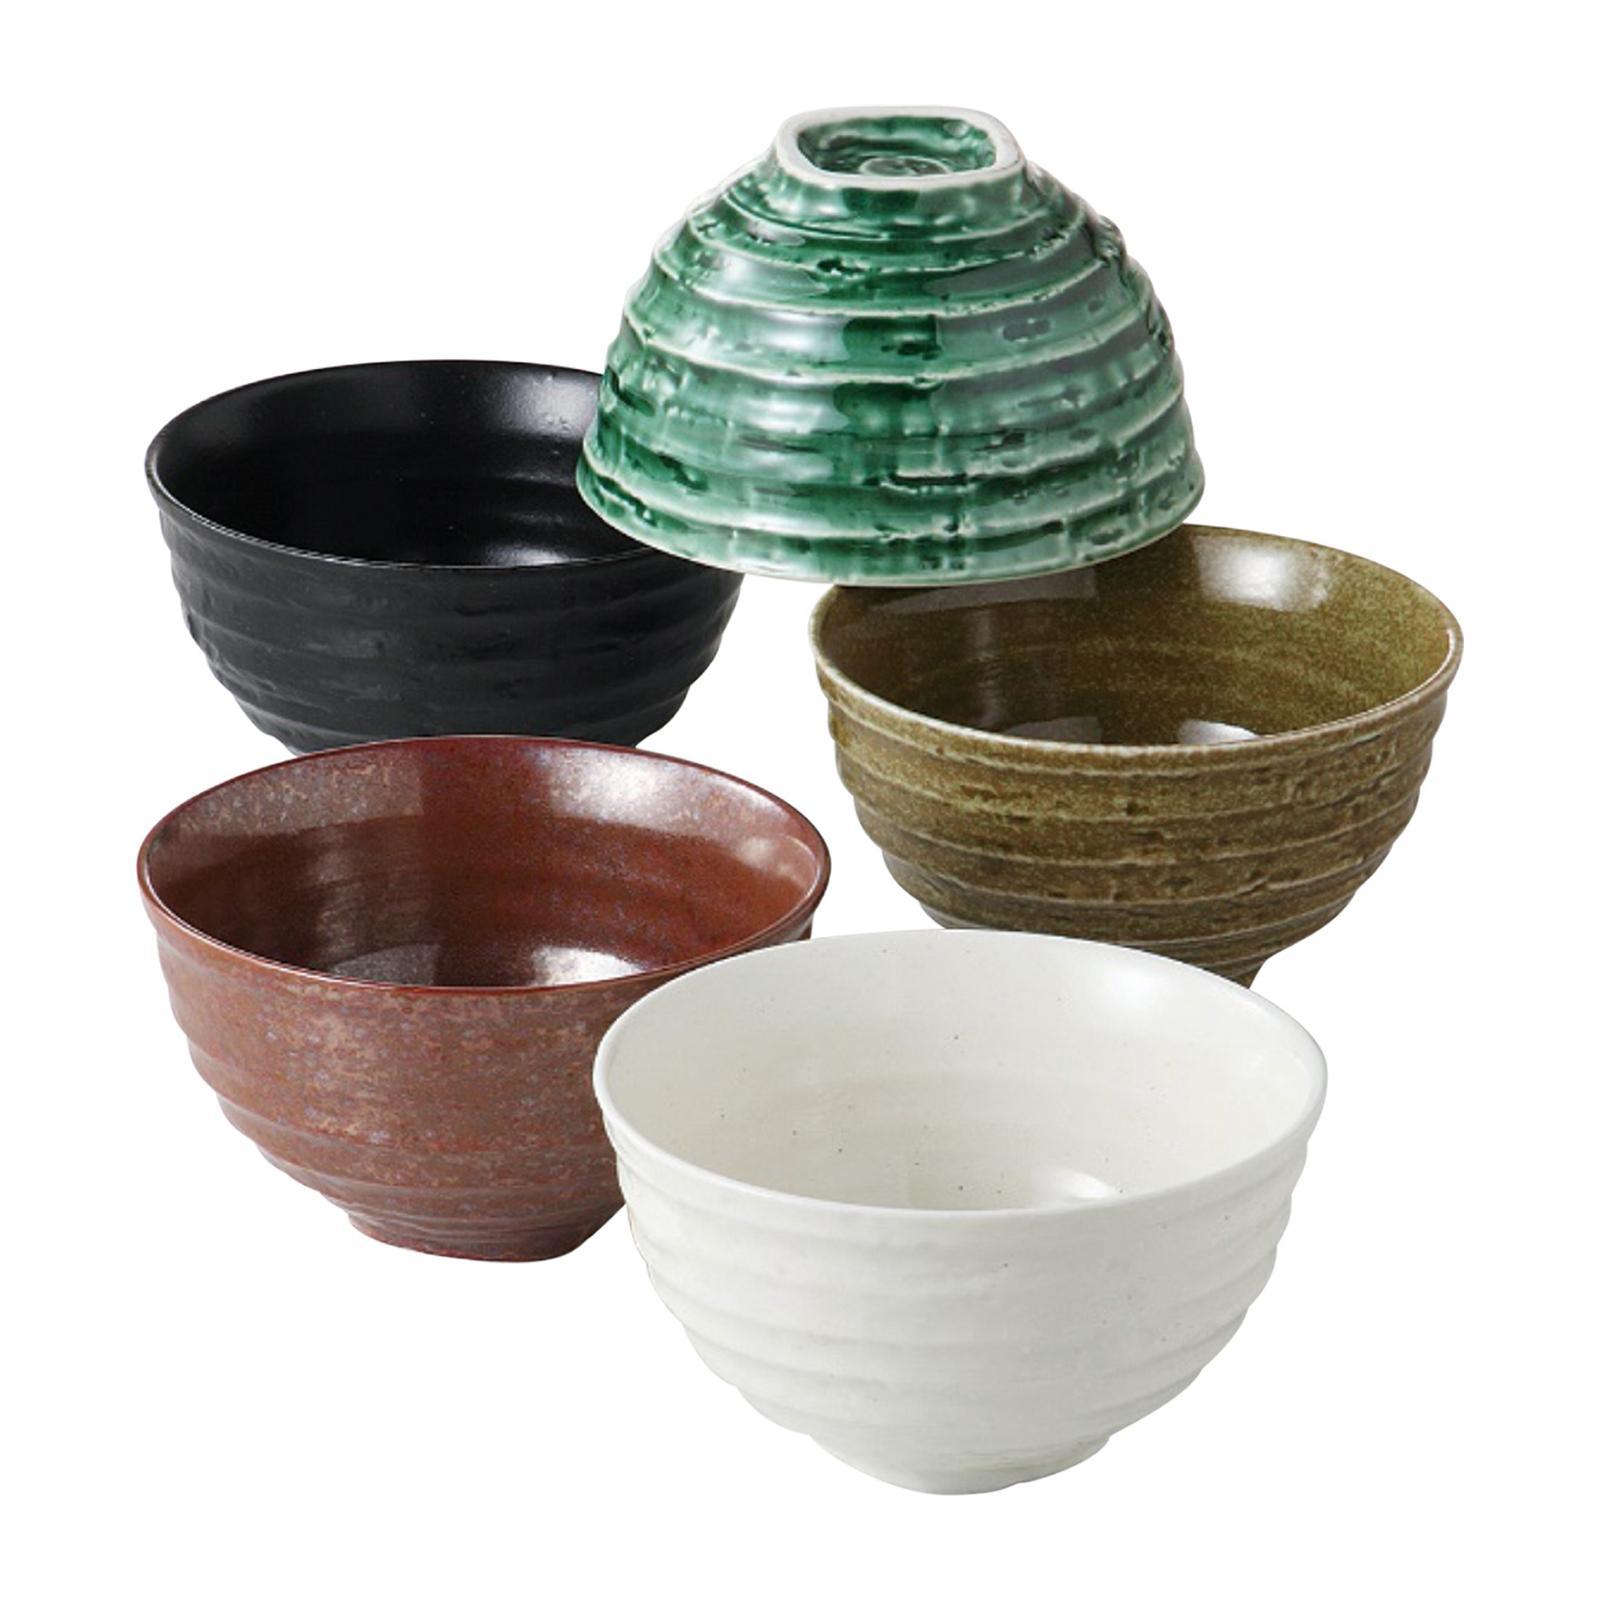 Tsuru 104 - 55 - 43 5 PCS Rice Bowl Set